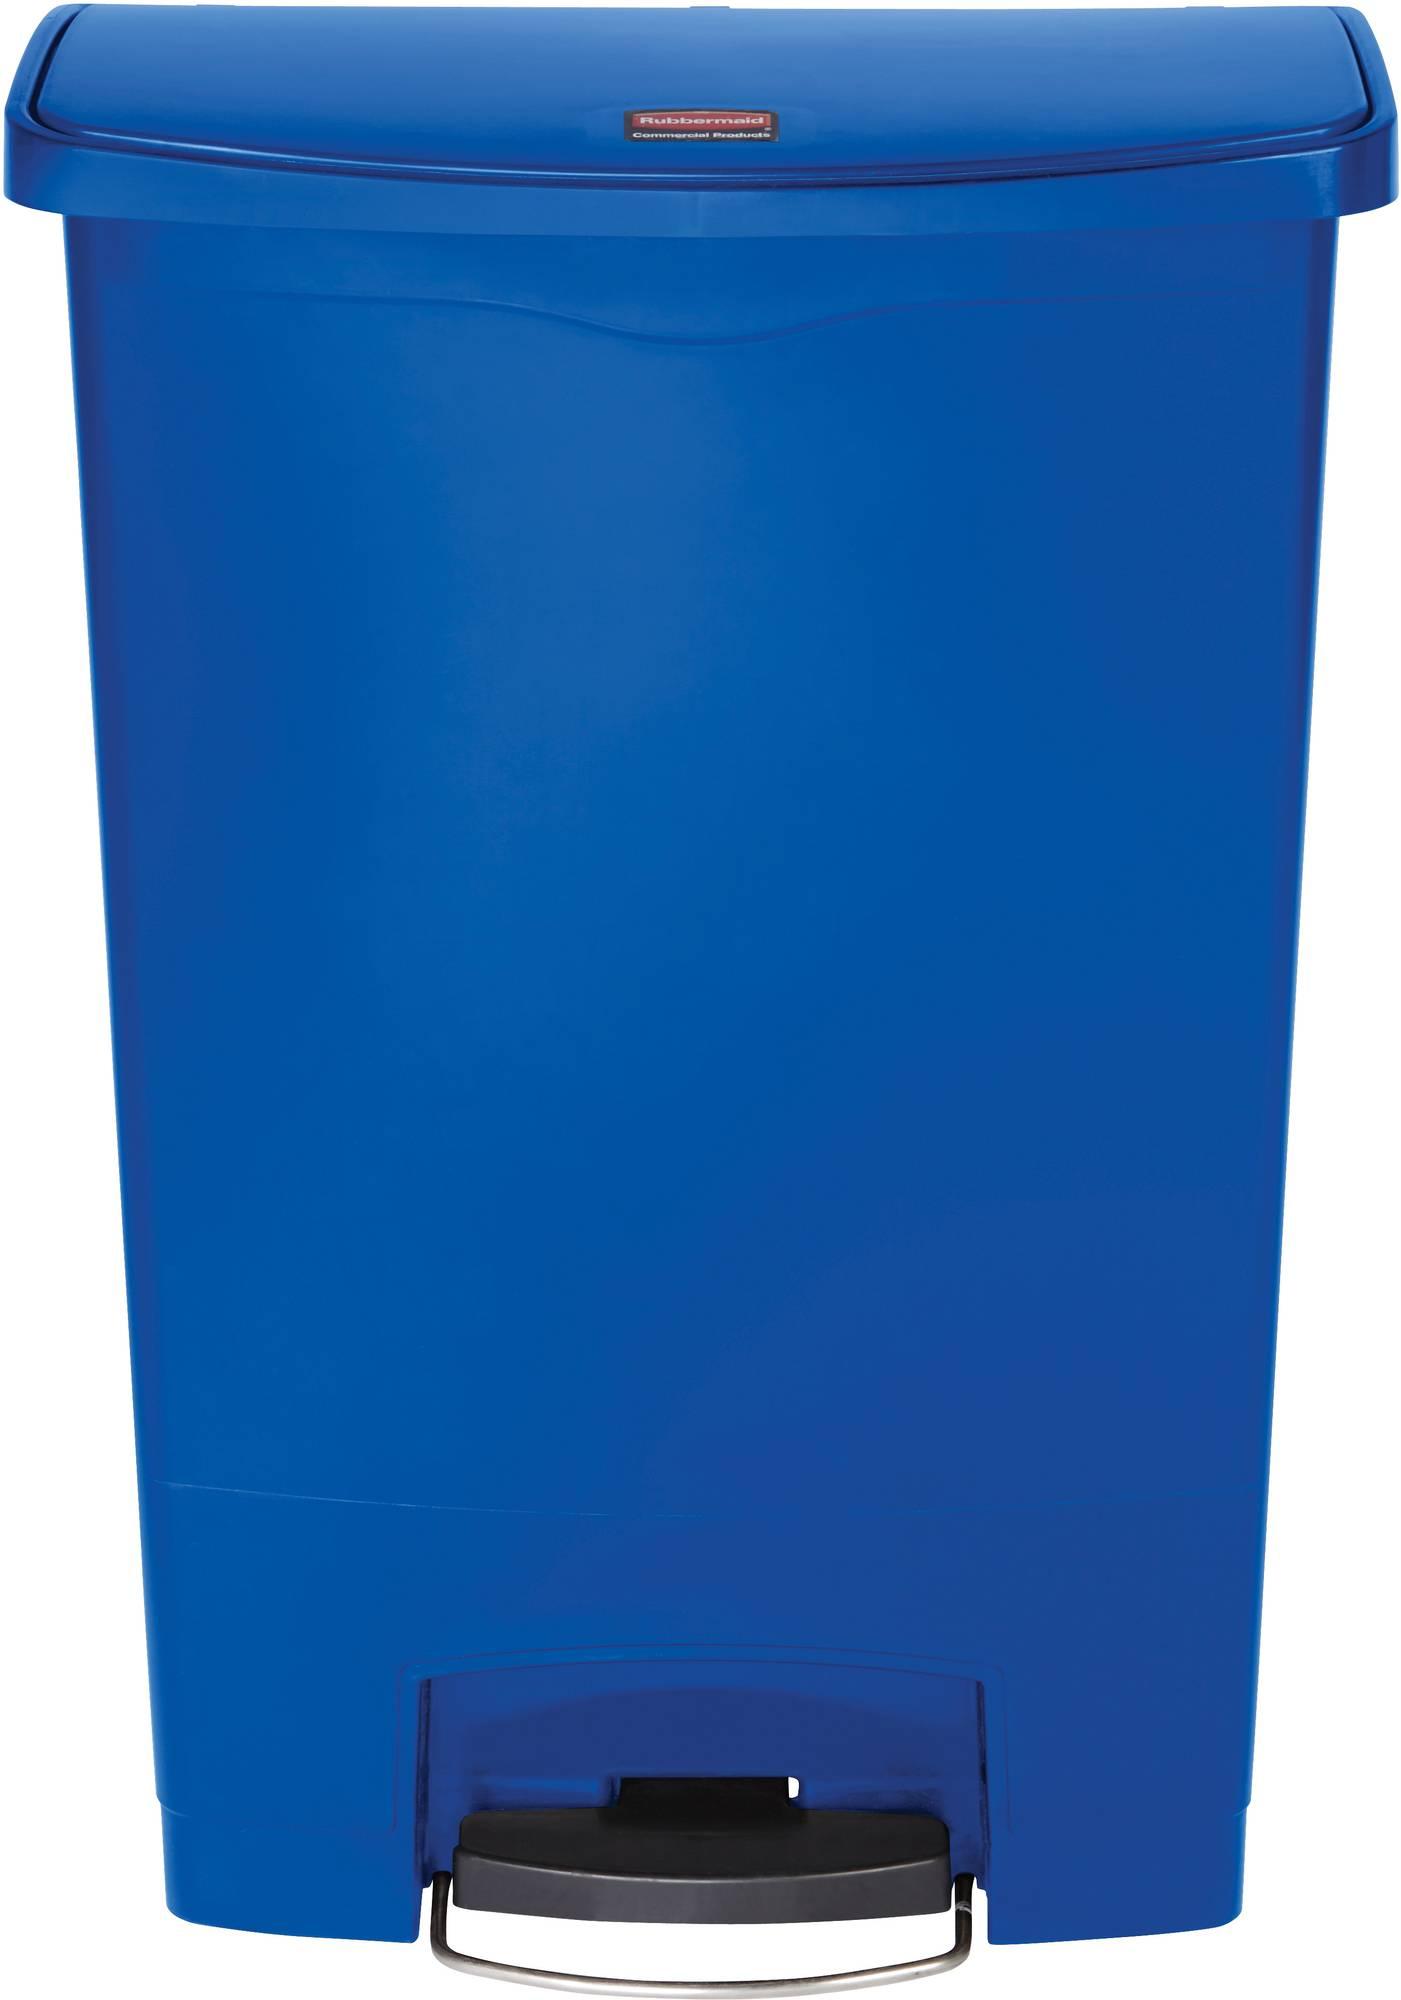 Rubbermaid Slim Jim Step On Container, Front Step mit 90 Liter Füllmenge in Blau, breites Fußpedal